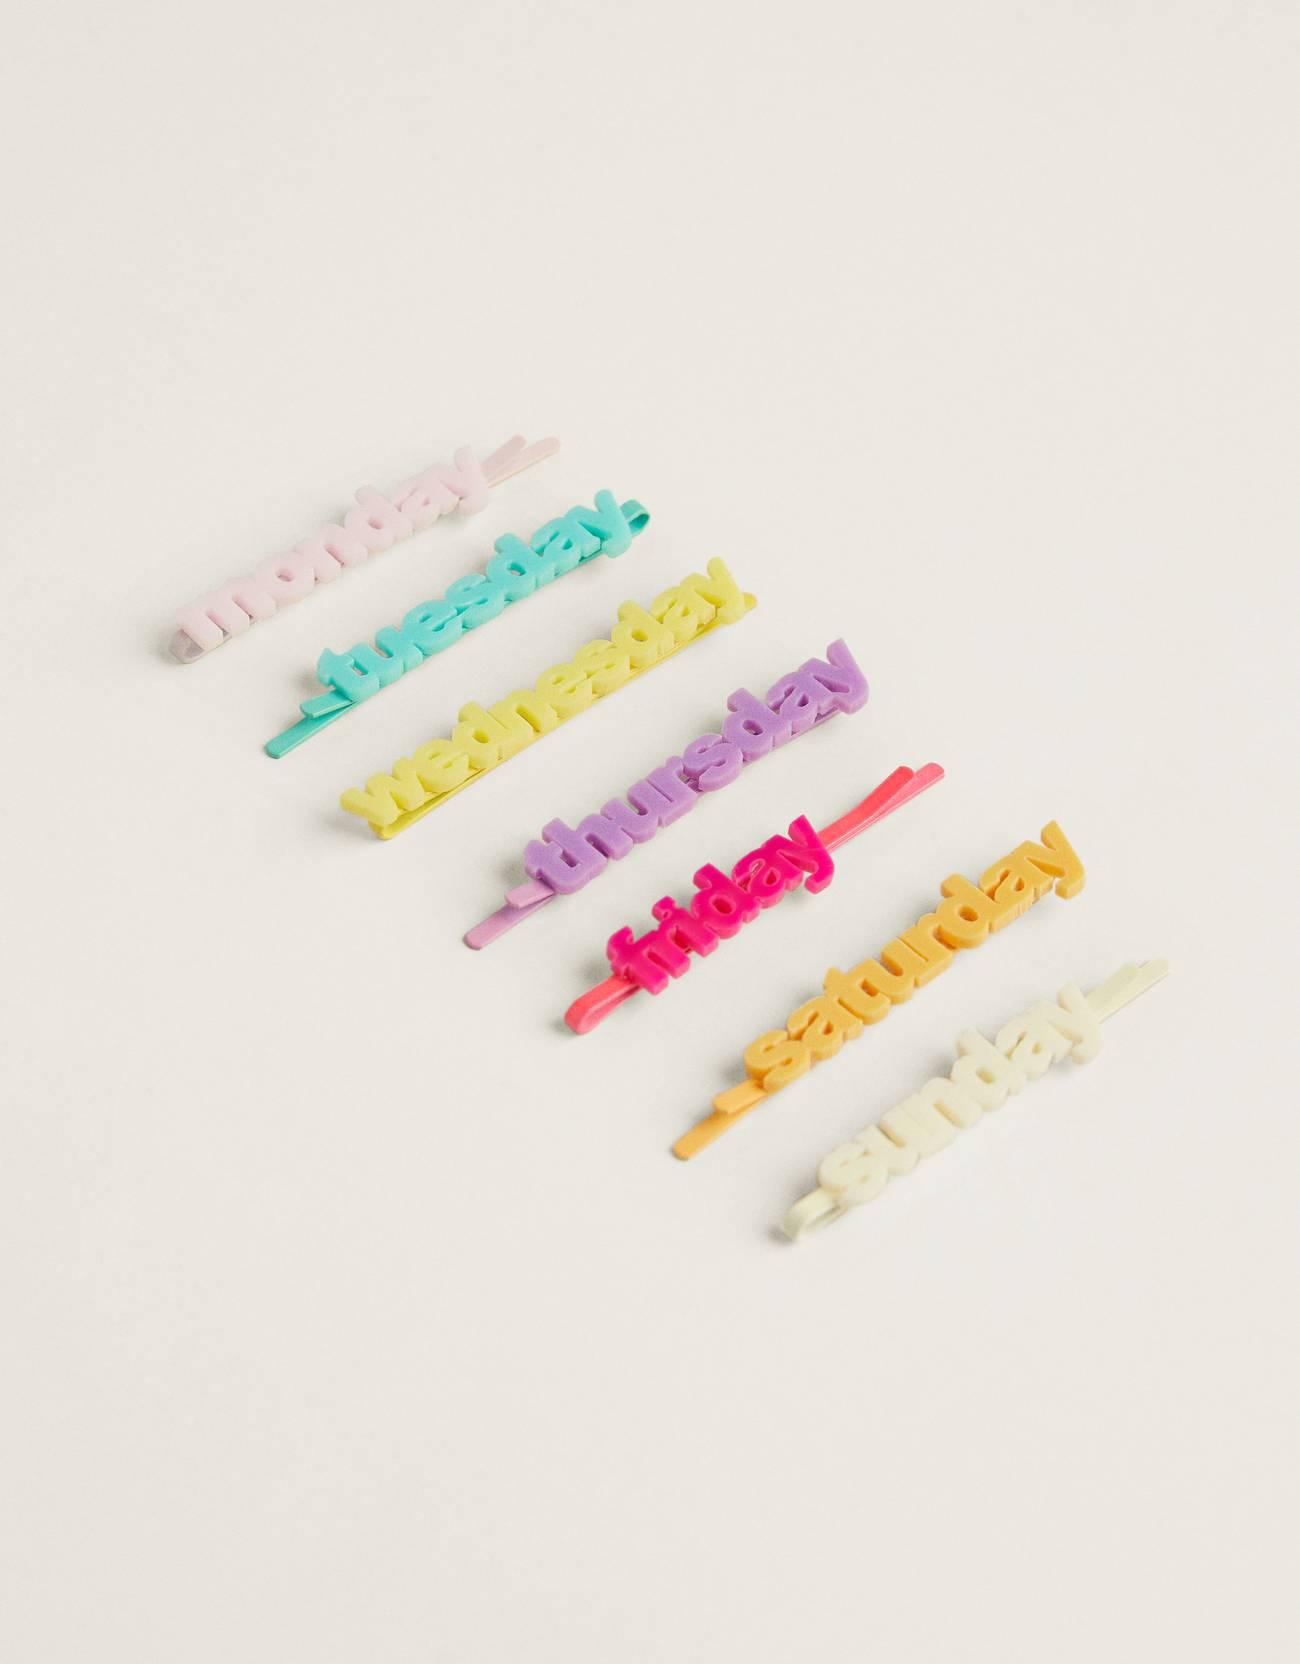 Pack de clips semanal multicolor.